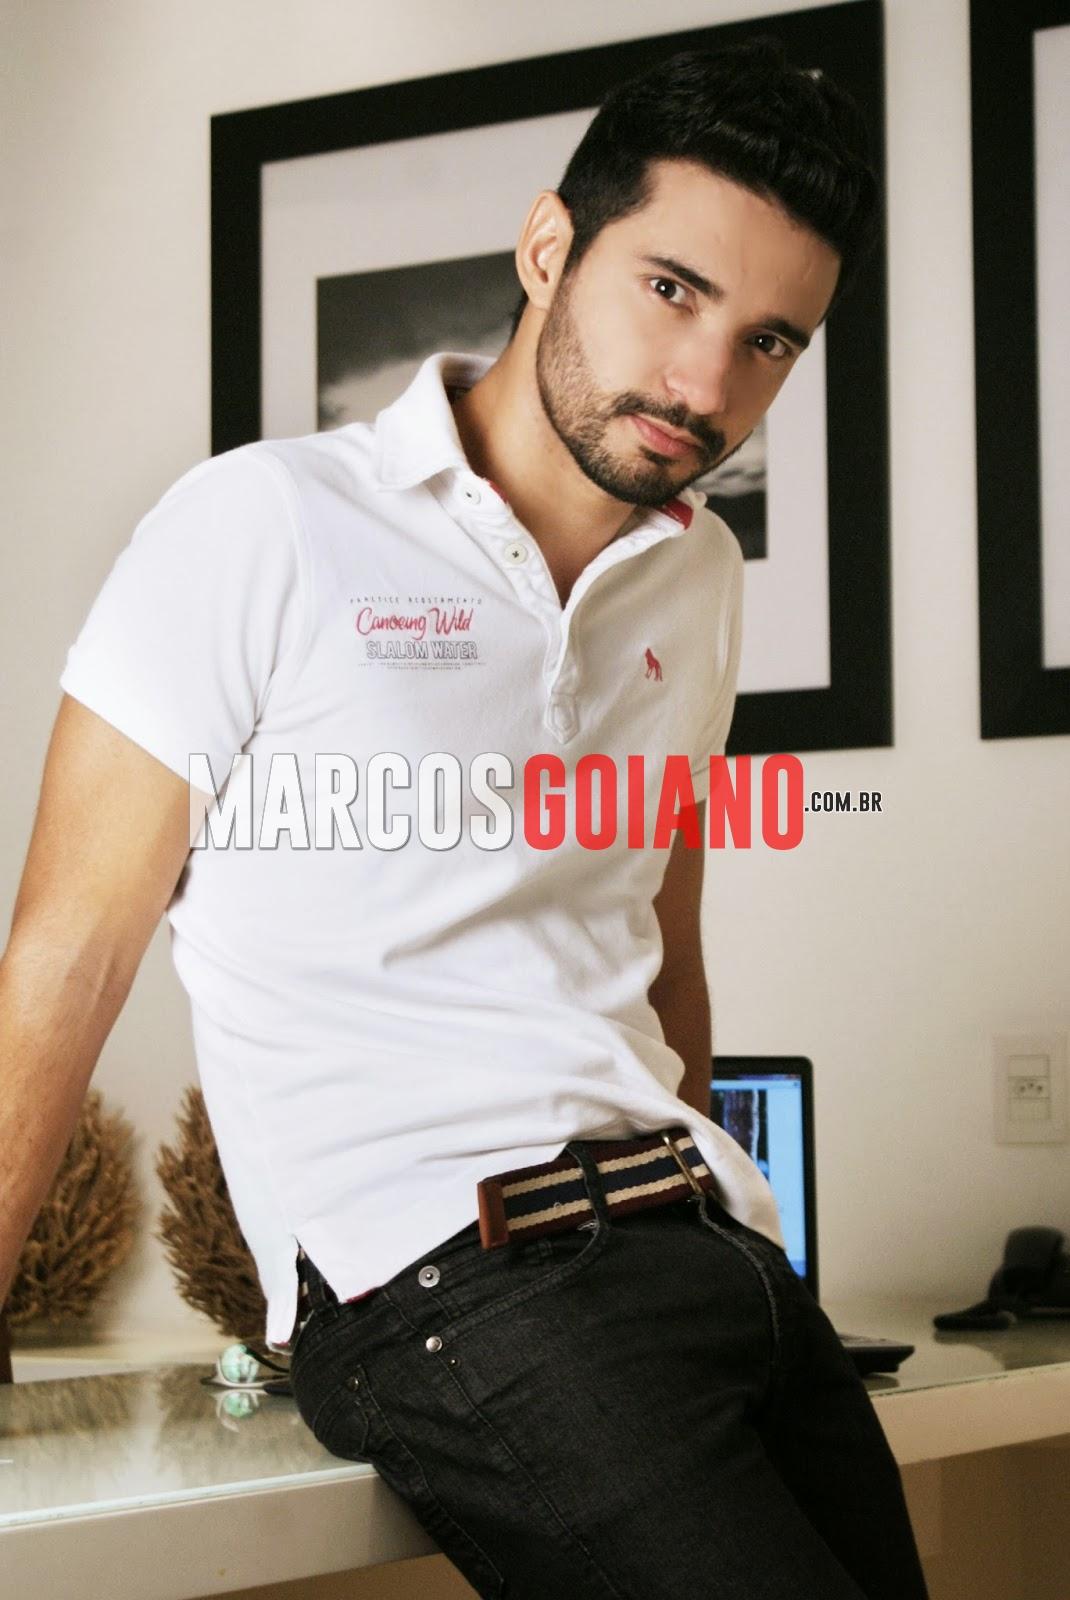 Marcos Goiano; Garoto Programa; Escort SP